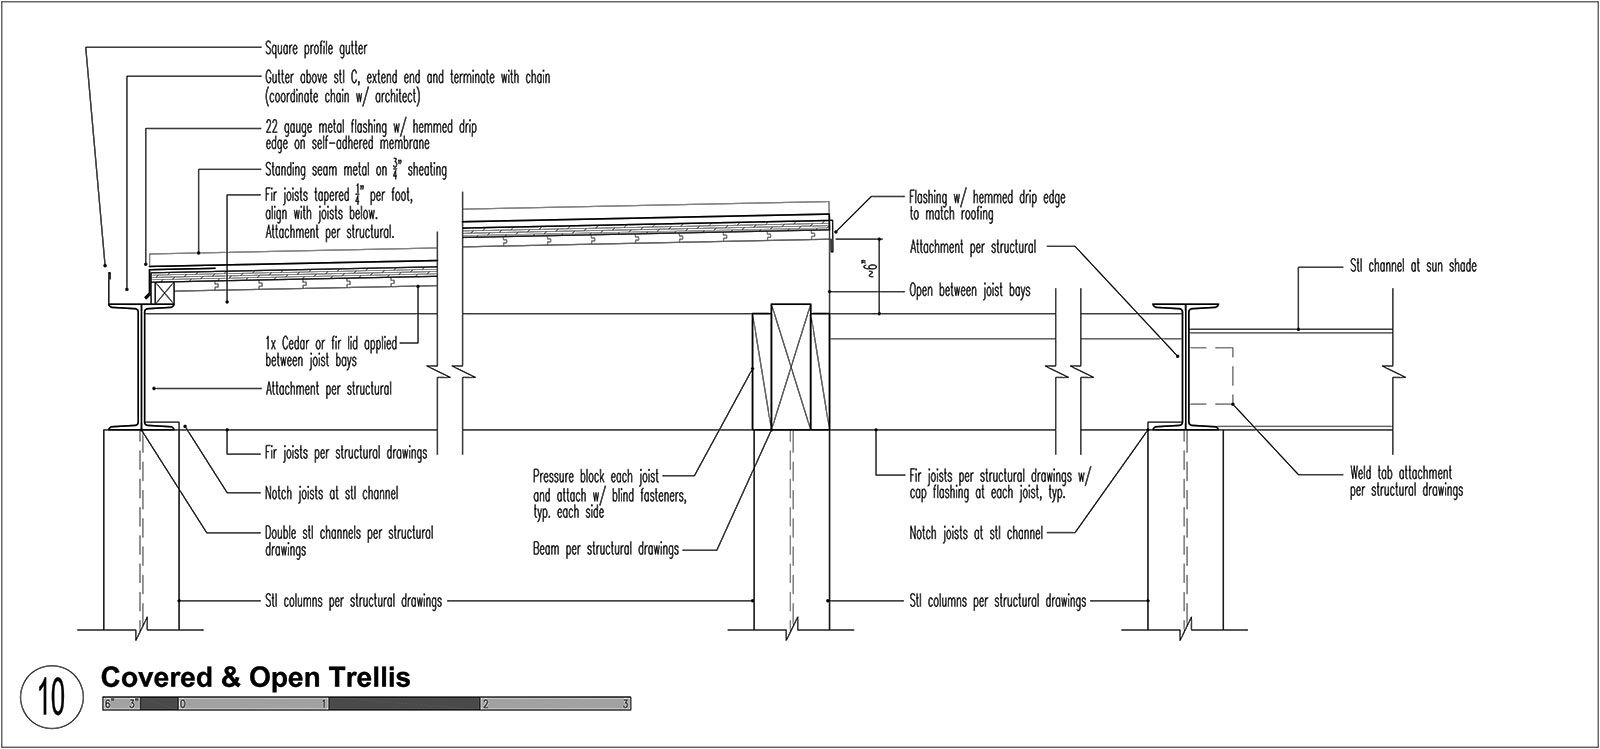 Build Llc Roof Details 02 Jpg 1600 749 Roofing Roof Repair Fibreglass Roof